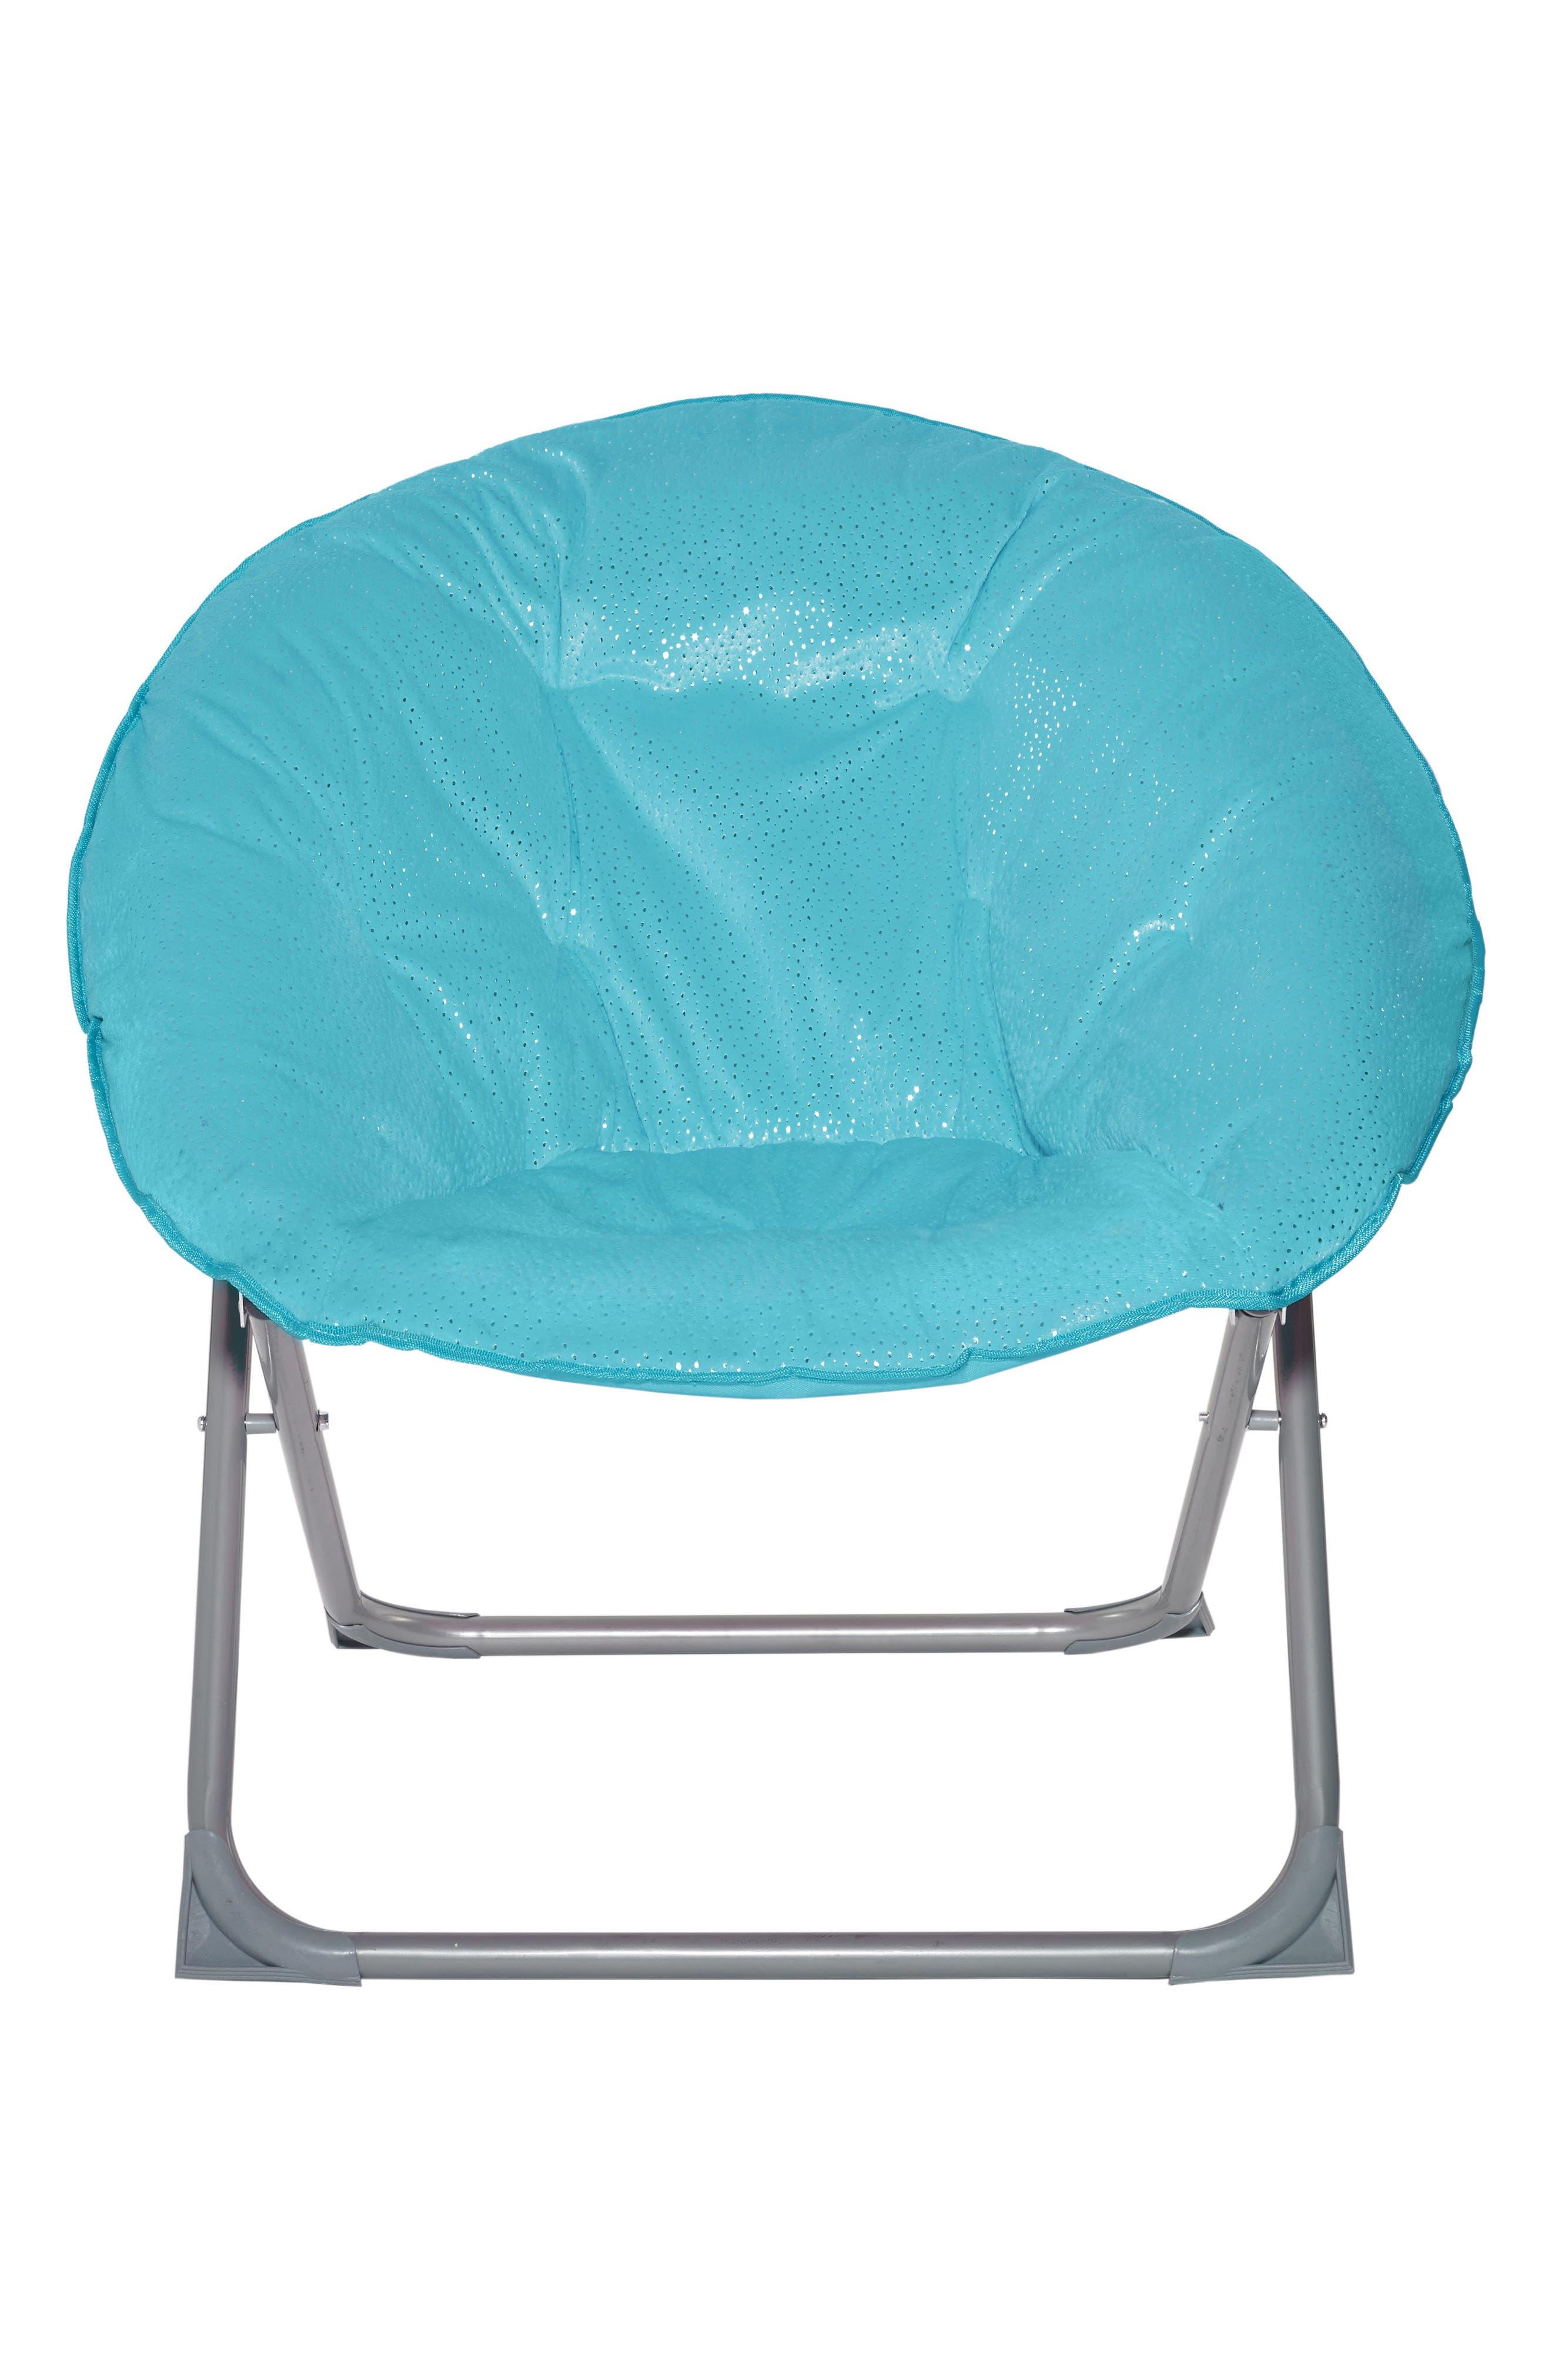 Main Image - 3C4G Sparkle Moon Chair